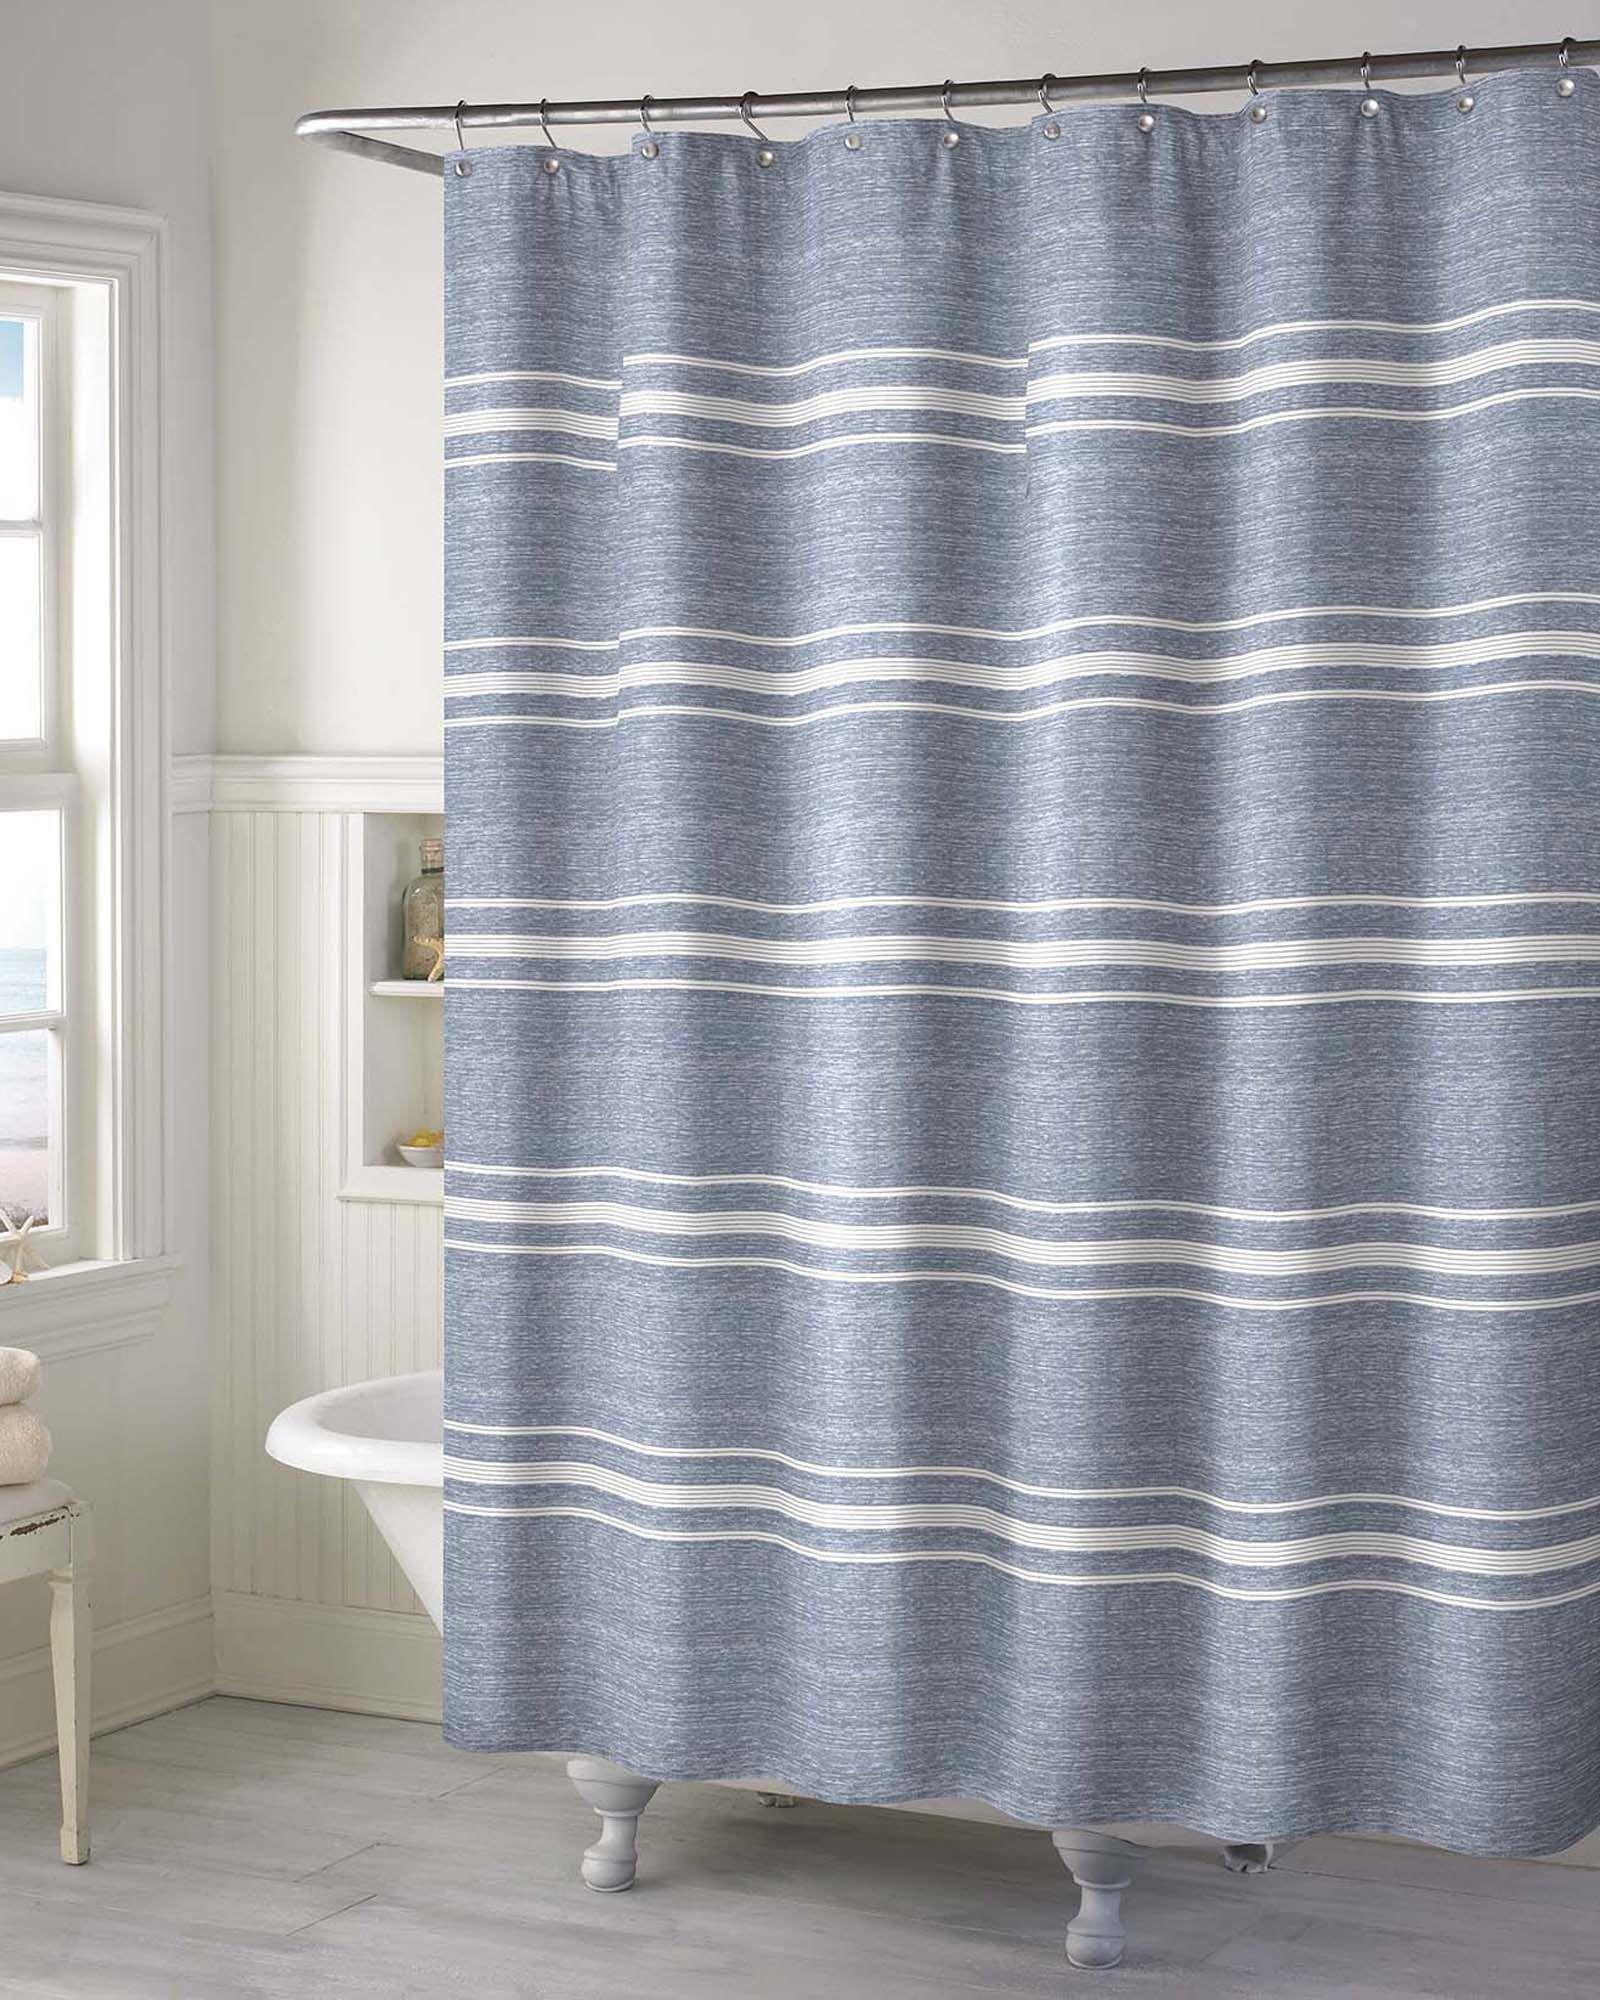 Style lounge linea shower curtain home u garden pinterest